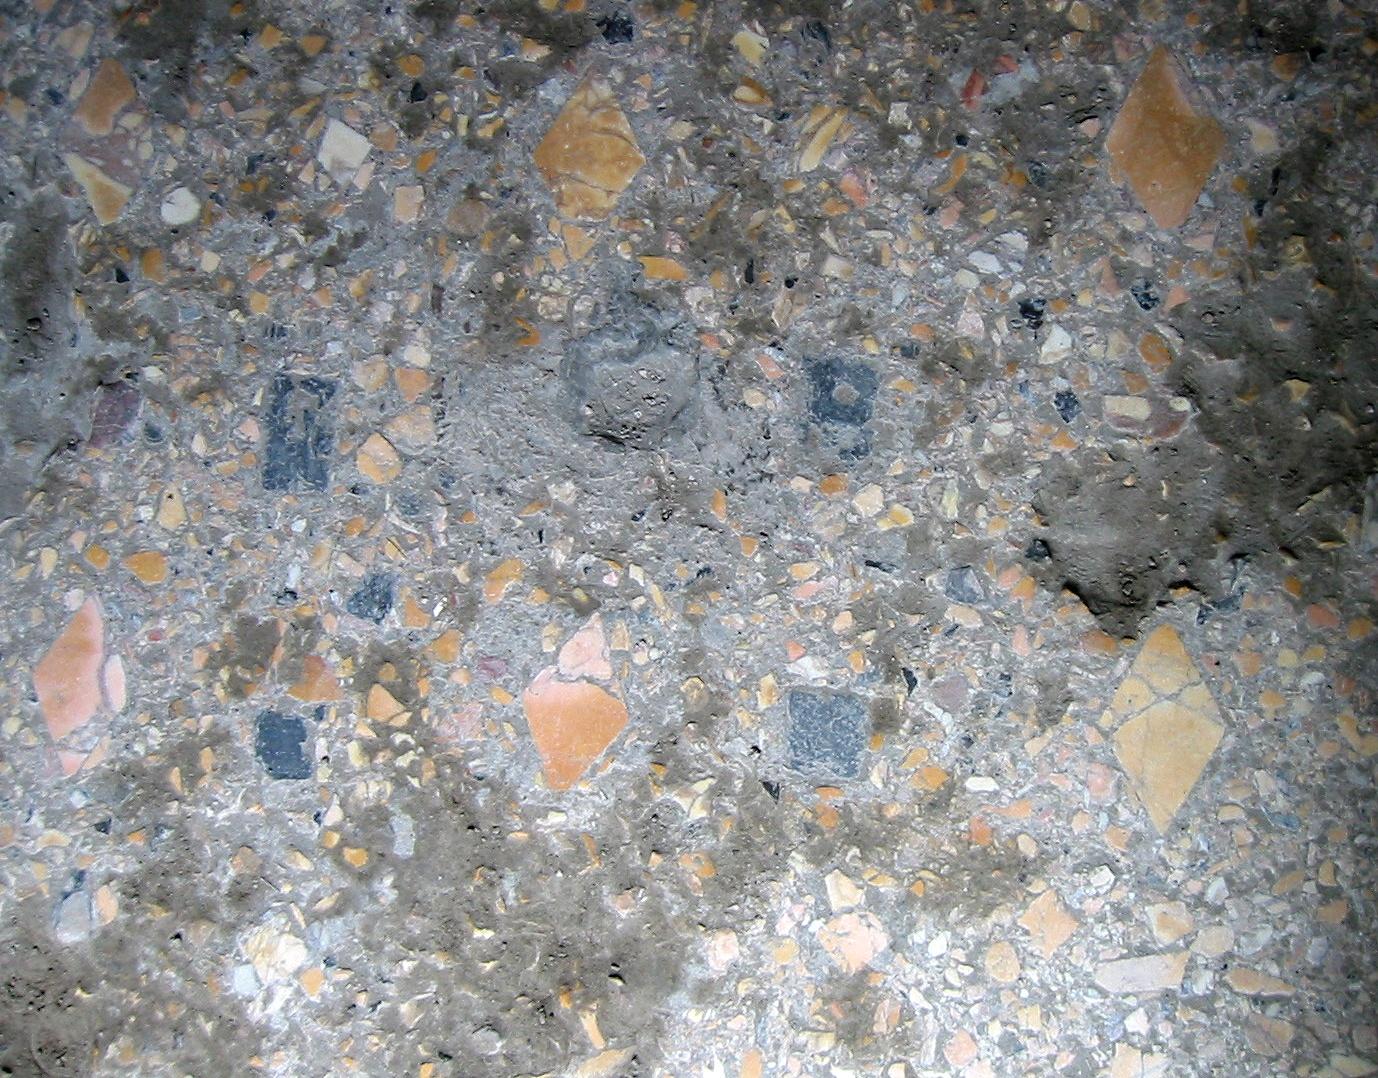 1000 images about terrazzo on pinterest terrazzo tile - Terrazza o terrazzo ...